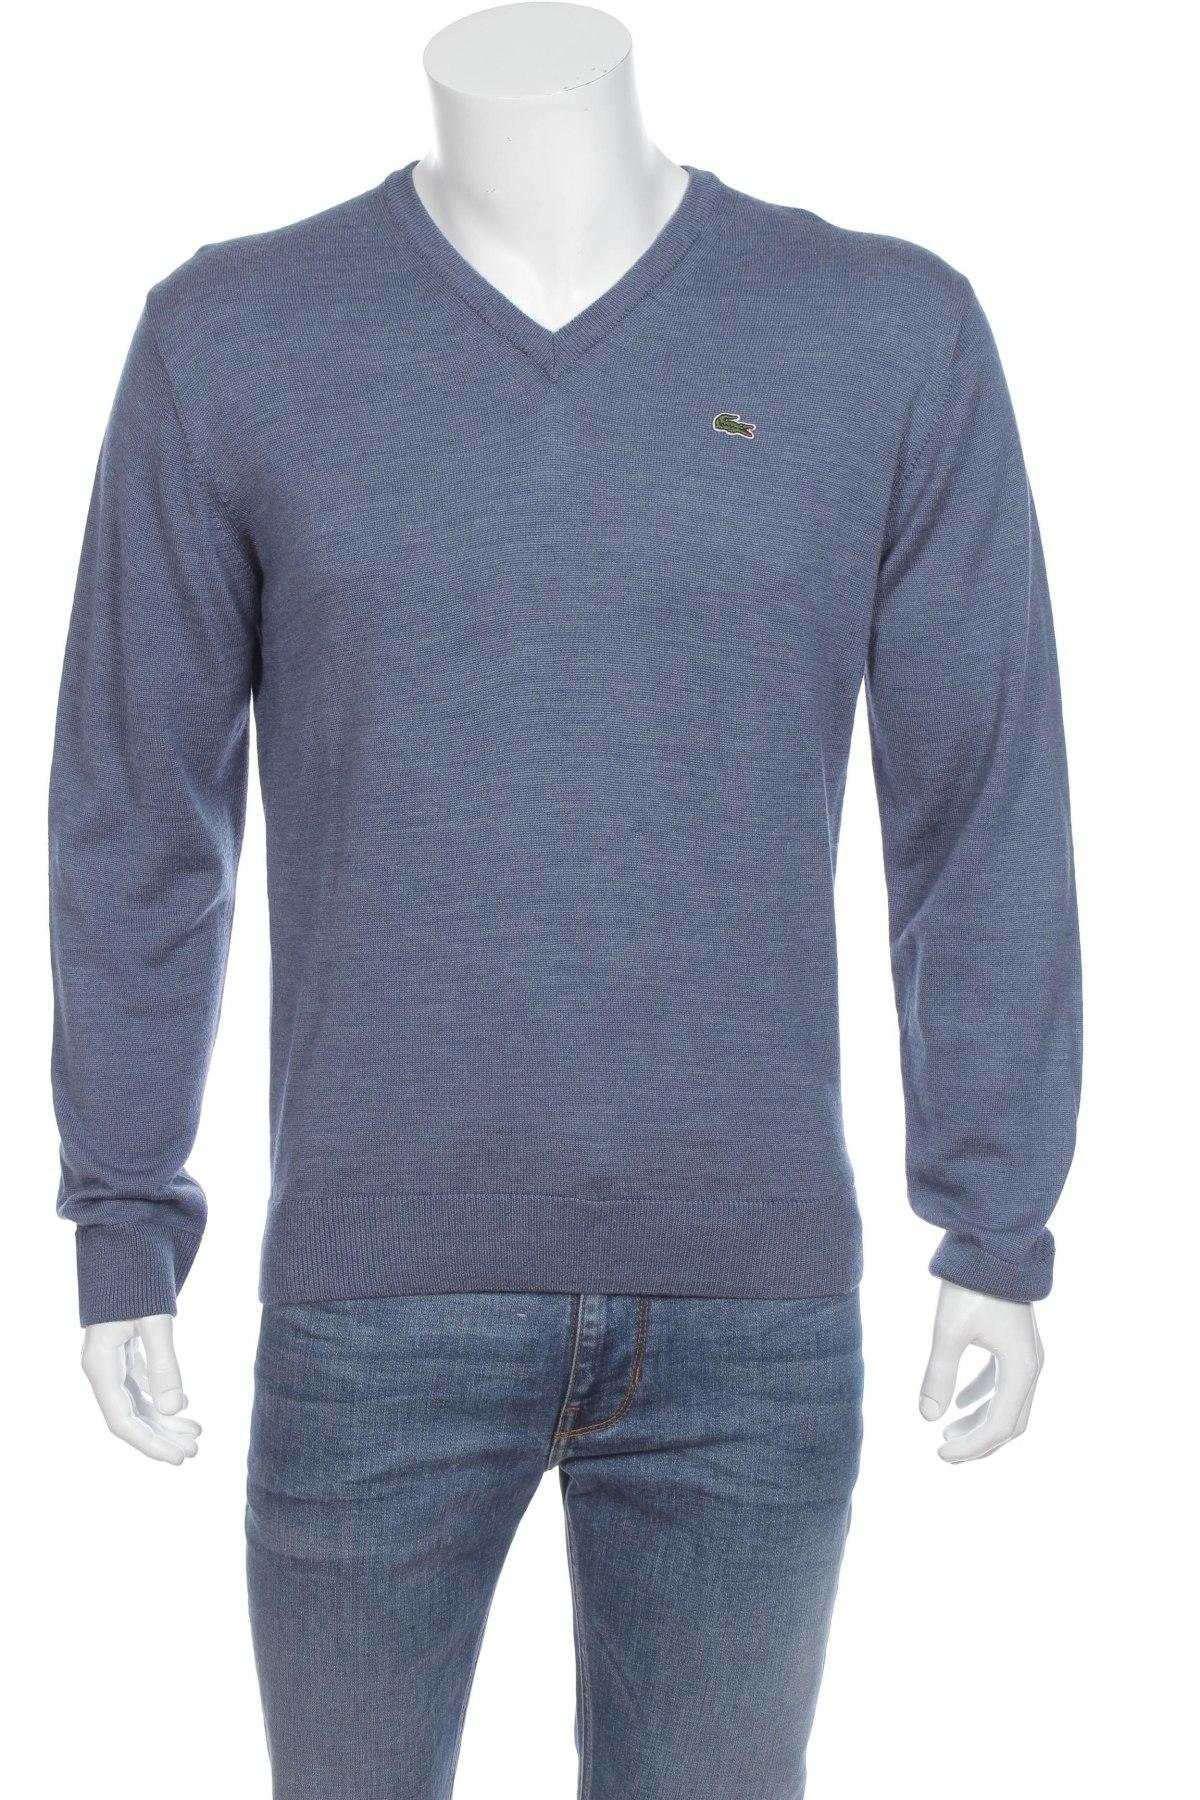 6f51df2786a44 Pánsky sveter Lacoste - za výhodnú cenu na Remix - #101822034